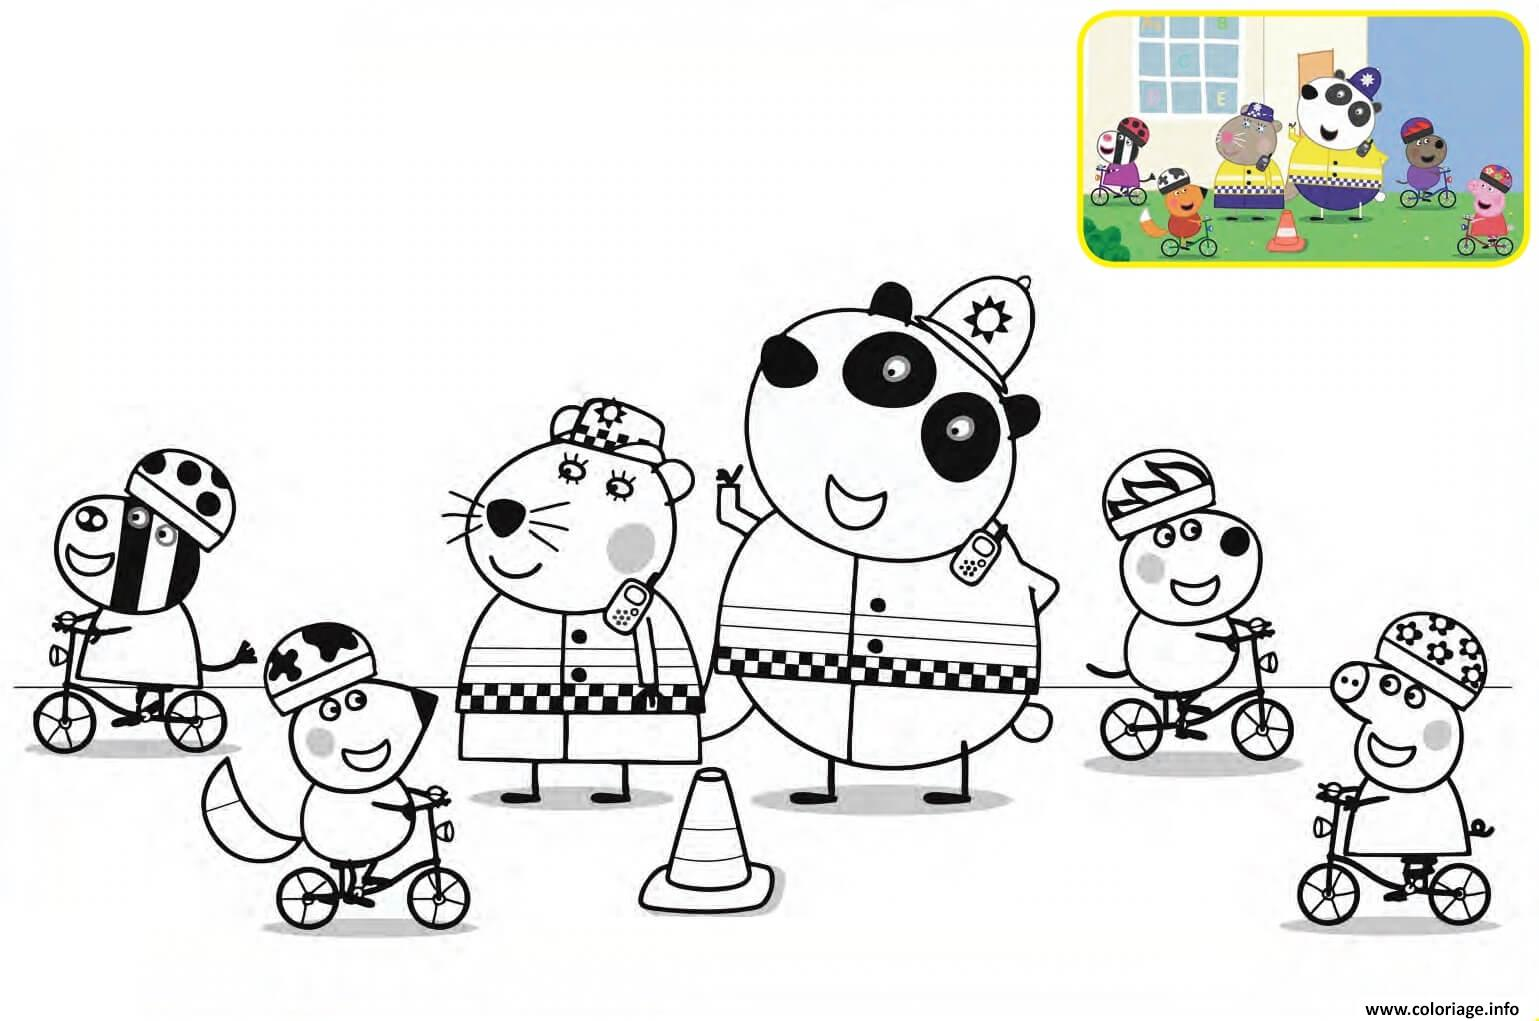 Coloriage Police Peppa Pig Velo Dessin Peppa Pig à imprimer